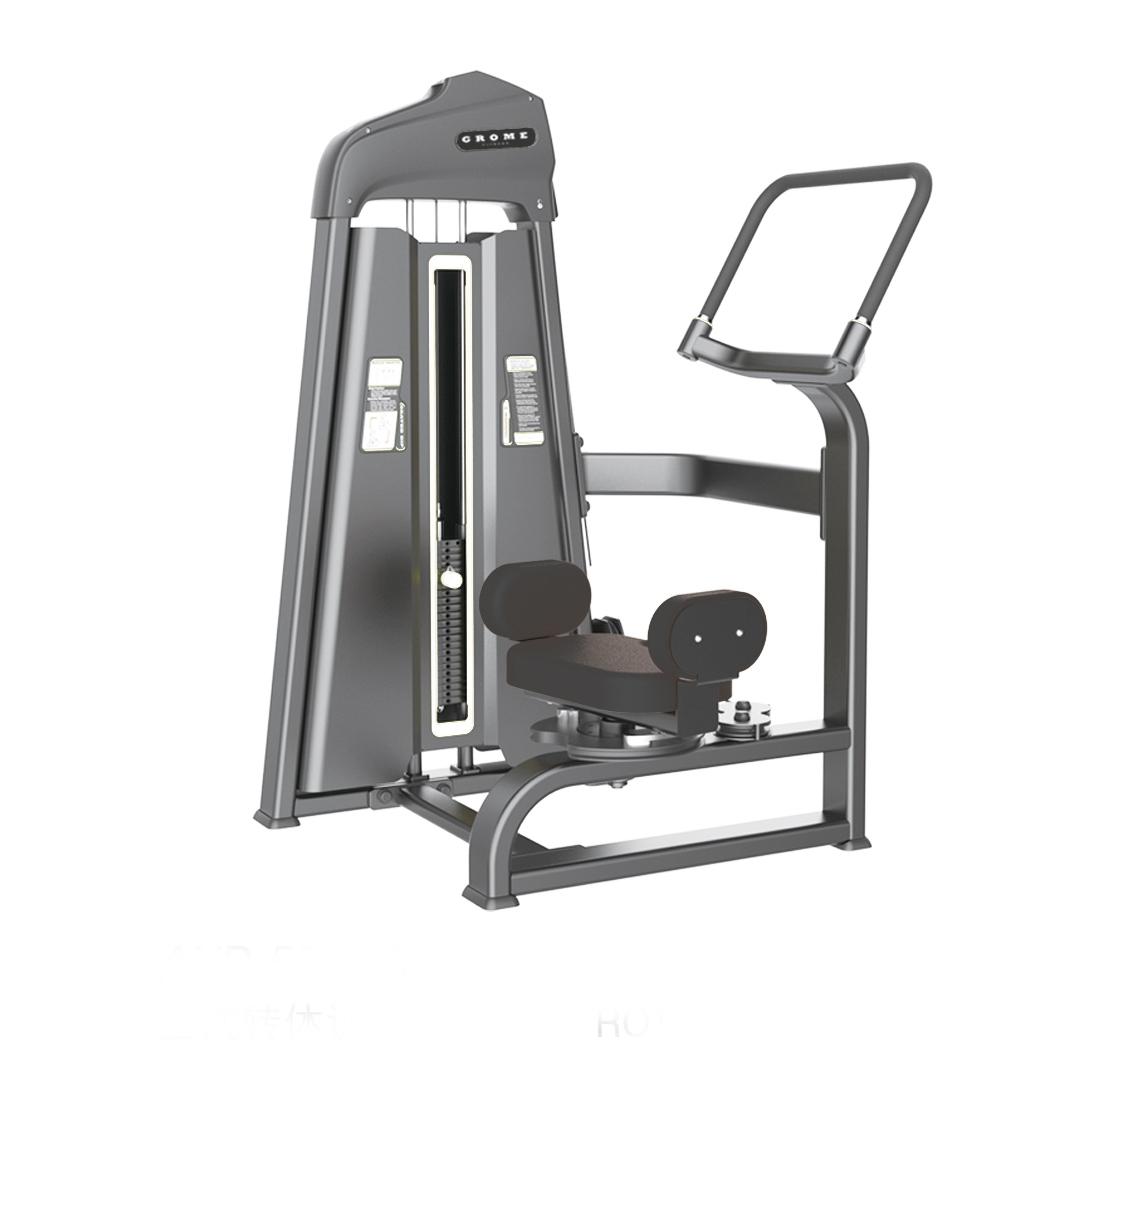 Тренажер GROME Fitness AXD5018A Вращение торса